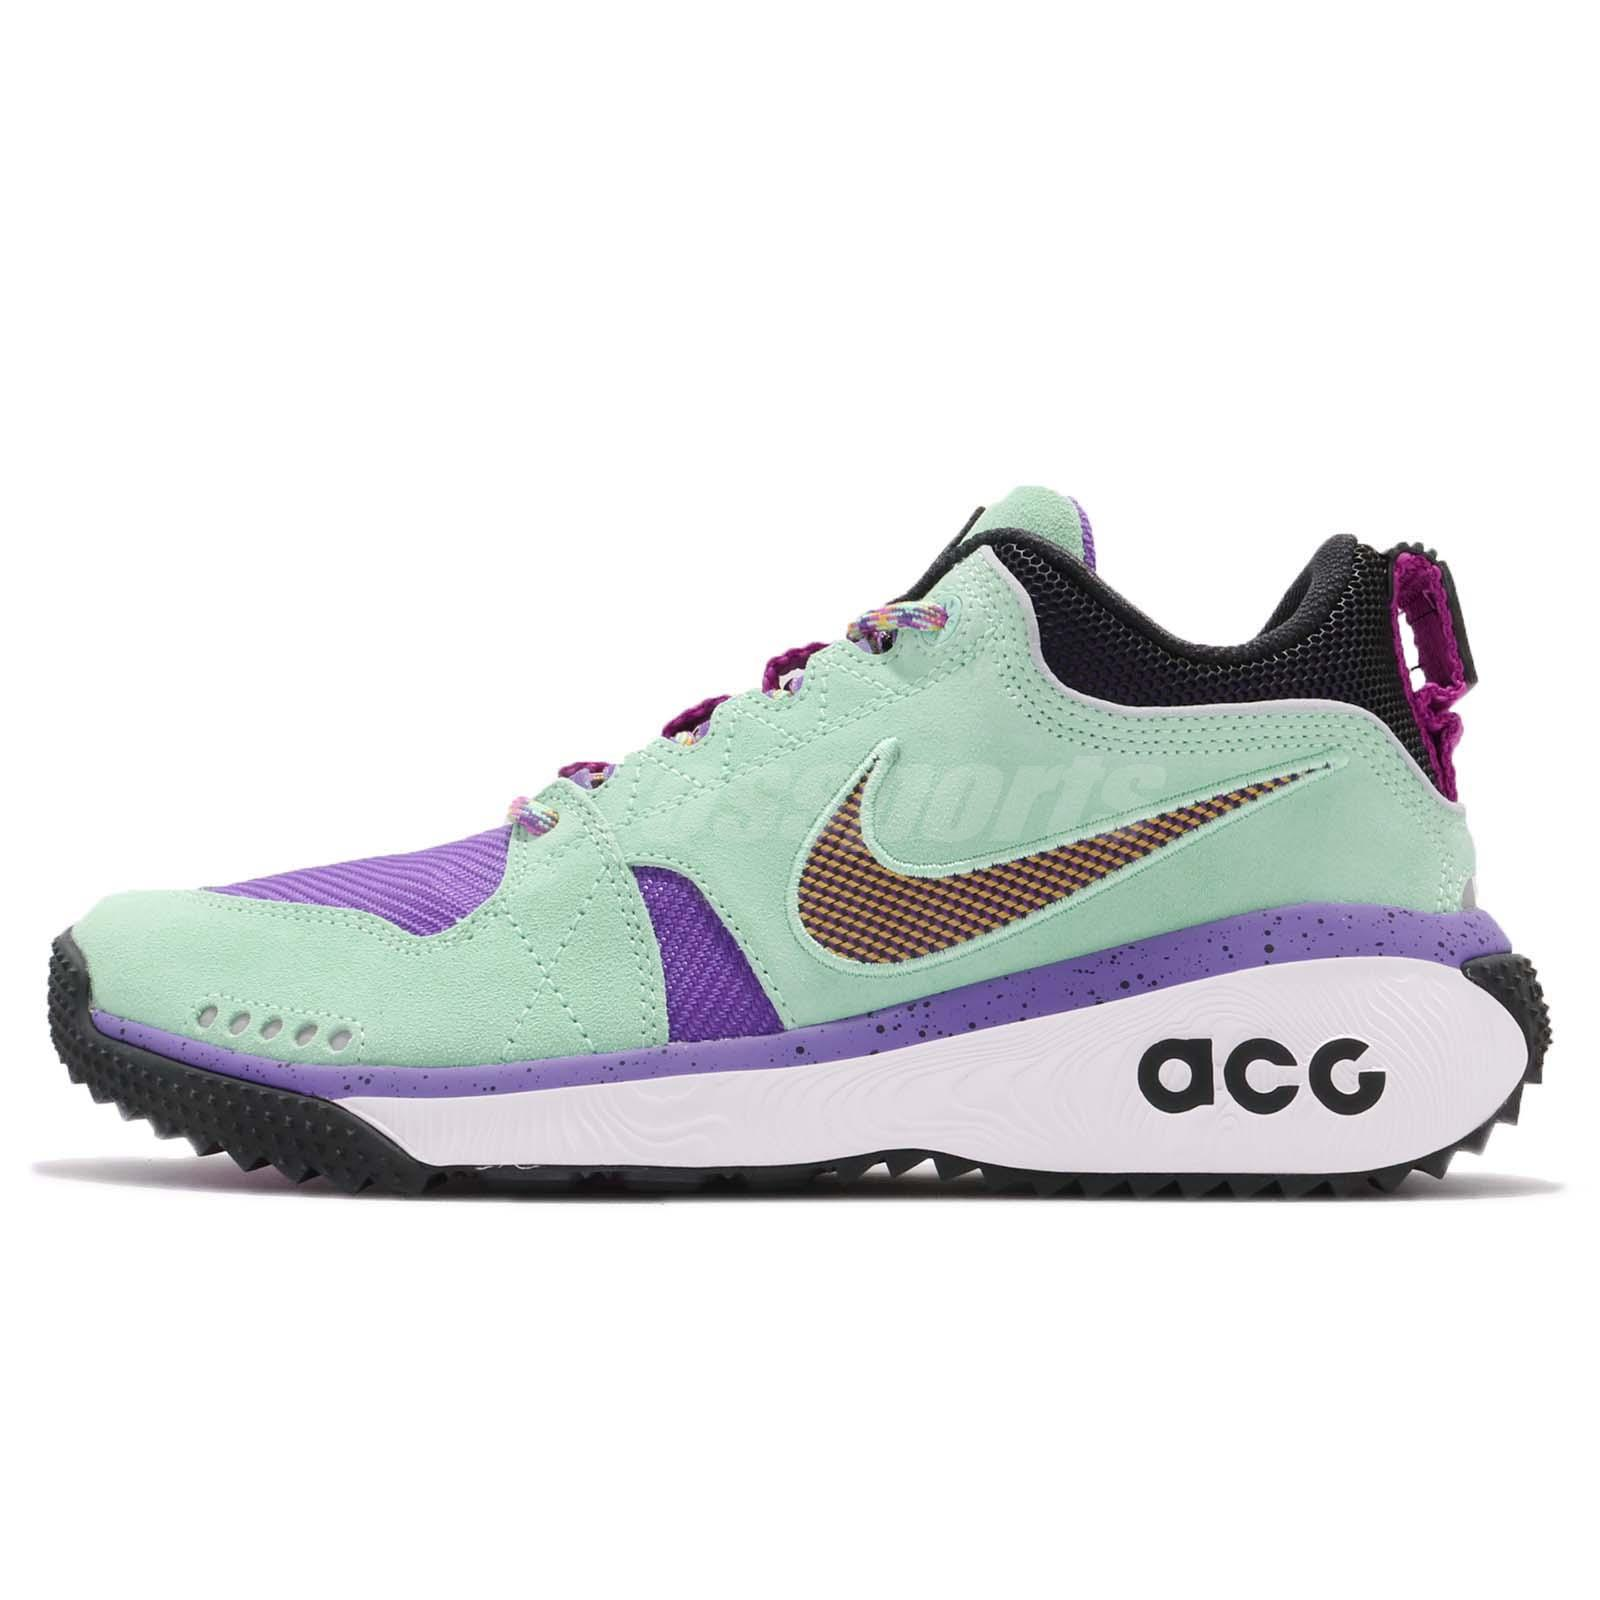 best website ca895 68834 Nike ACG Dog Mountain Emerald Rise Tour Yellow NikeLab Mens Shoes AQ0916-300